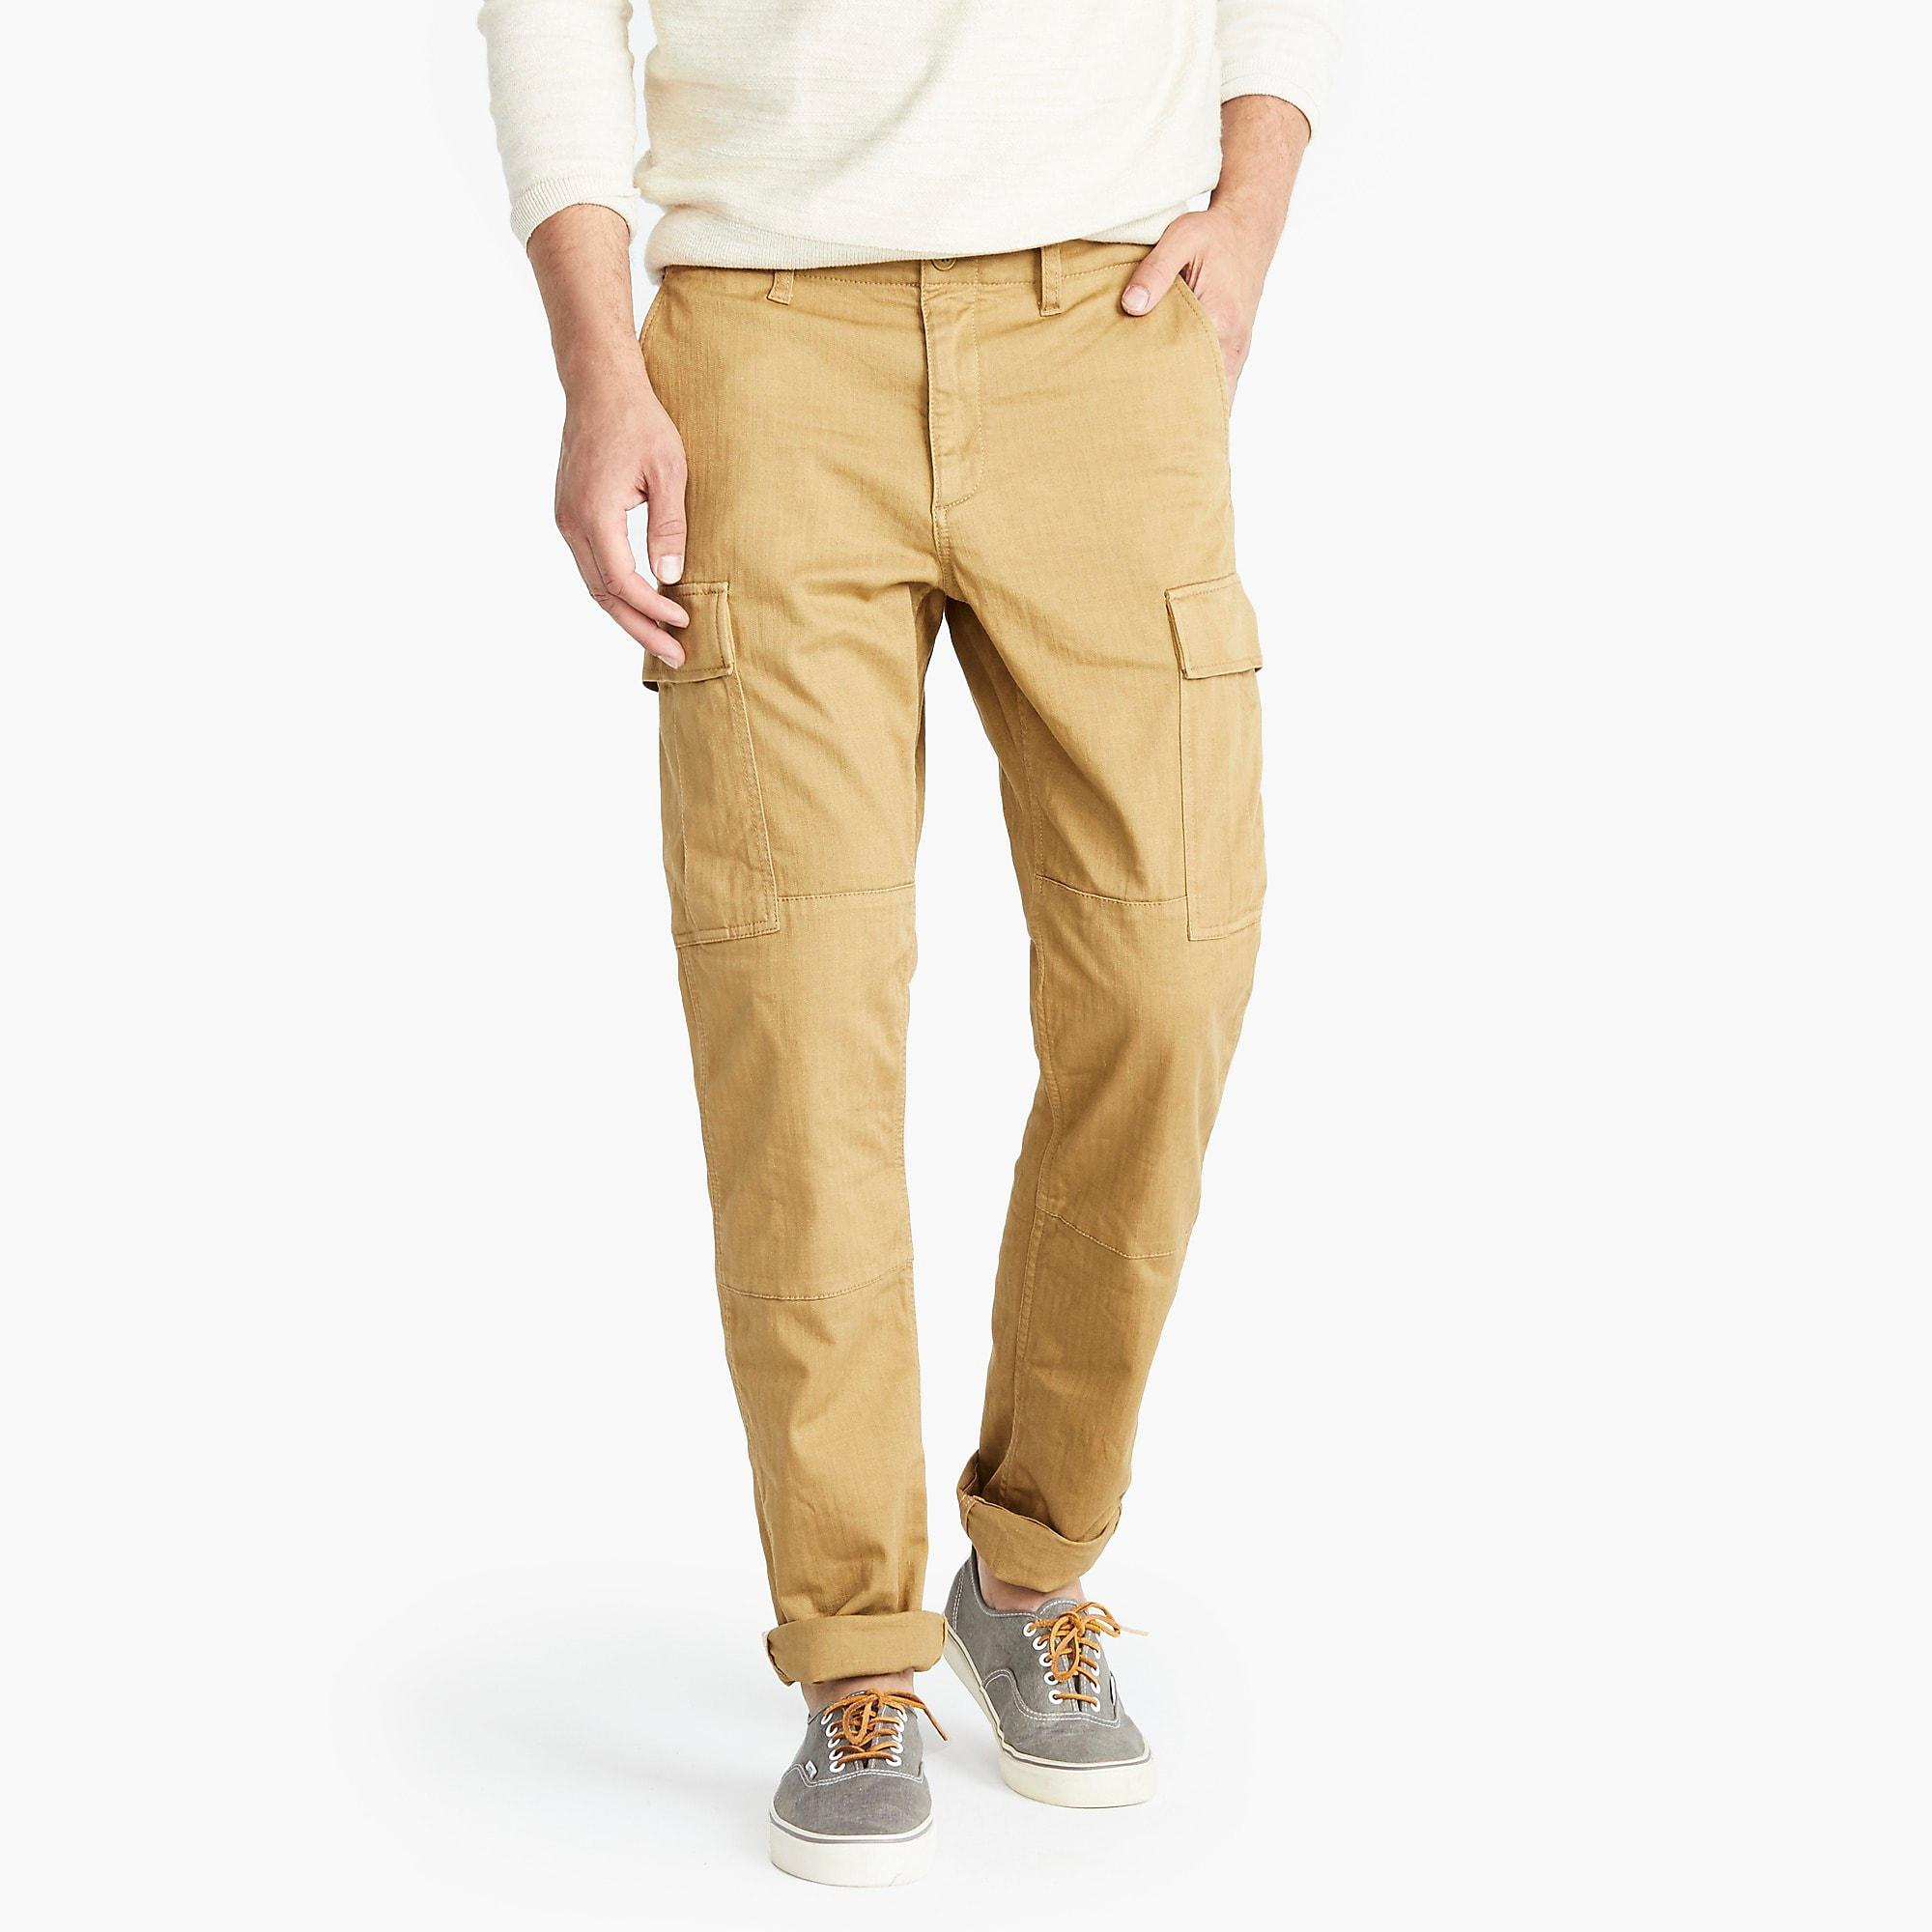 3a114fa77b J.Crew. Brown 770 Straight-fit Stretch Cargo Pant In Garment-dyed  Herringbone